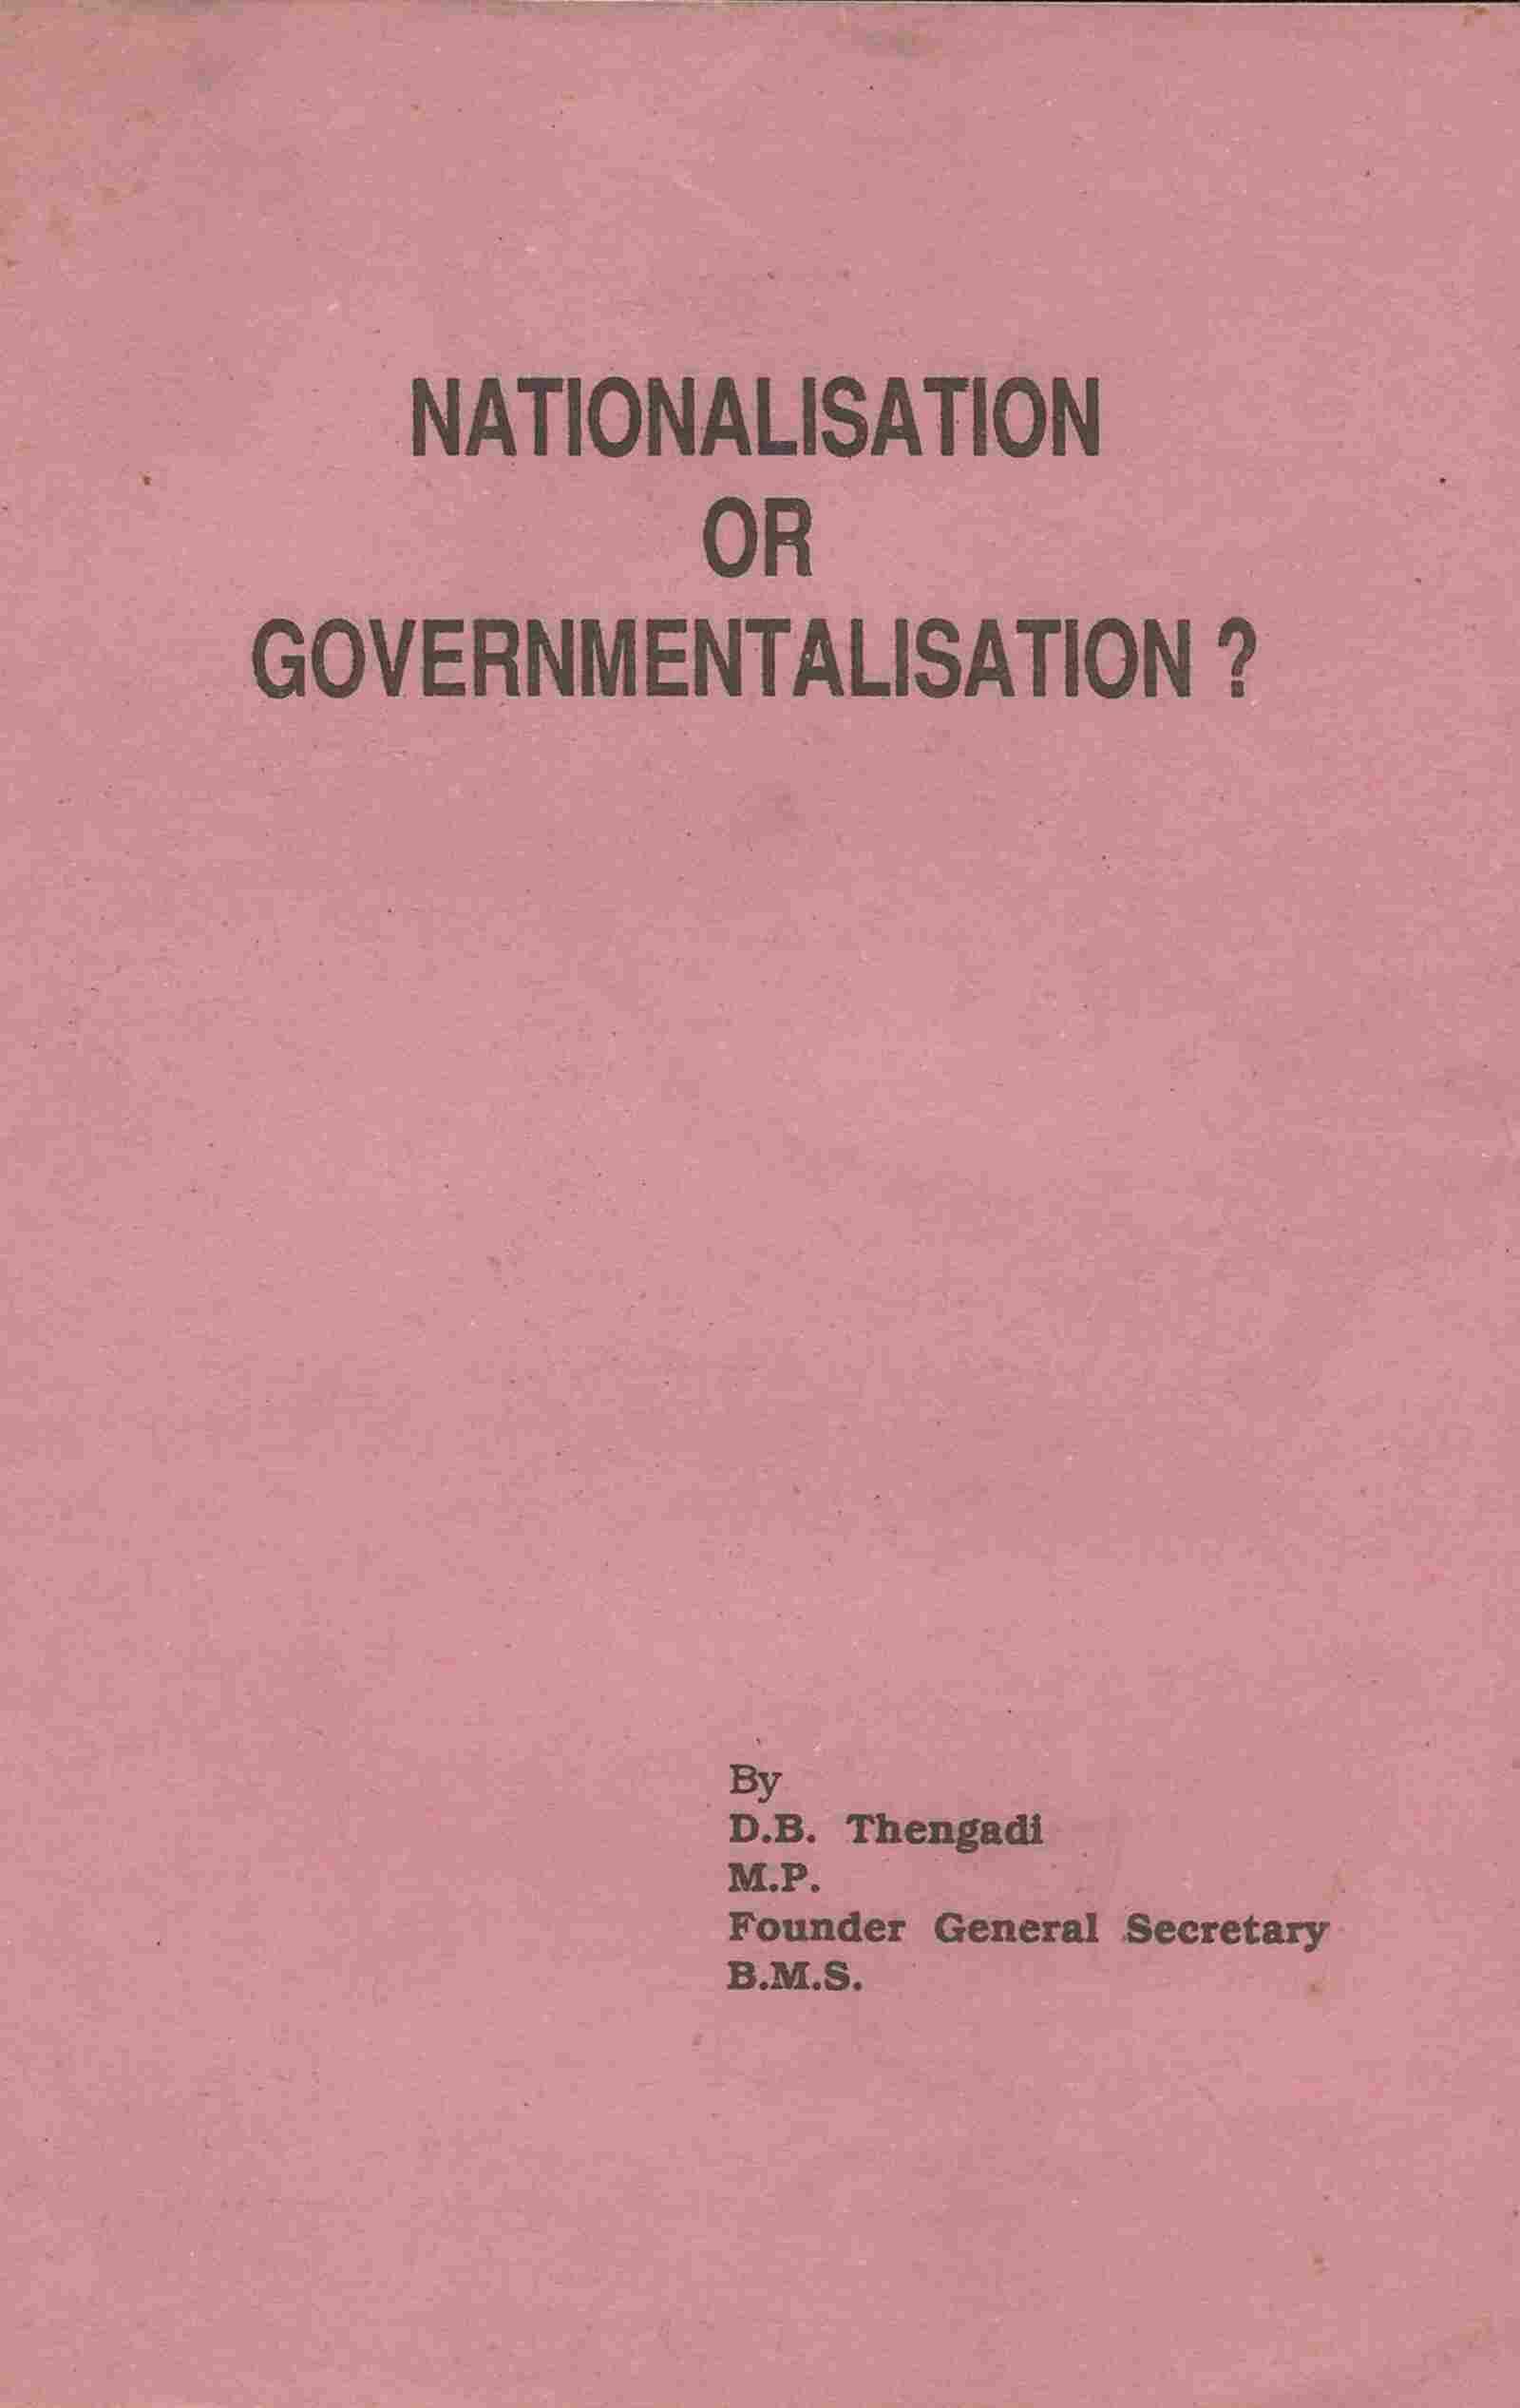 Nationalisation or Governmentalisation